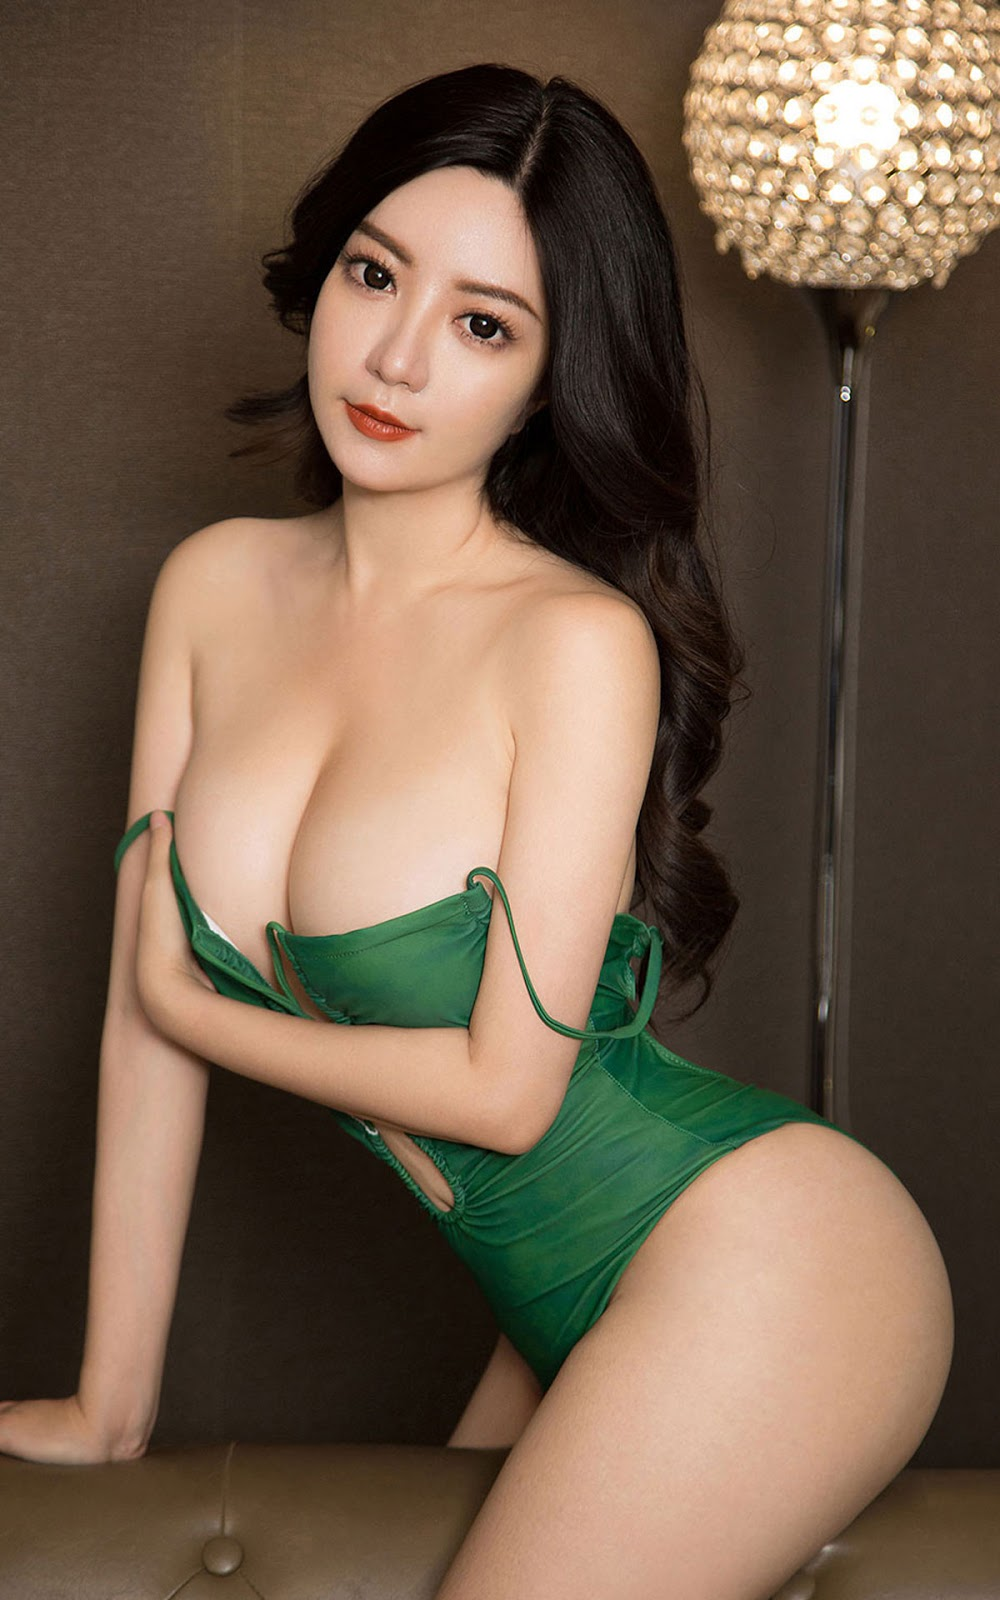 Tìm kiếm từ khóa: nude